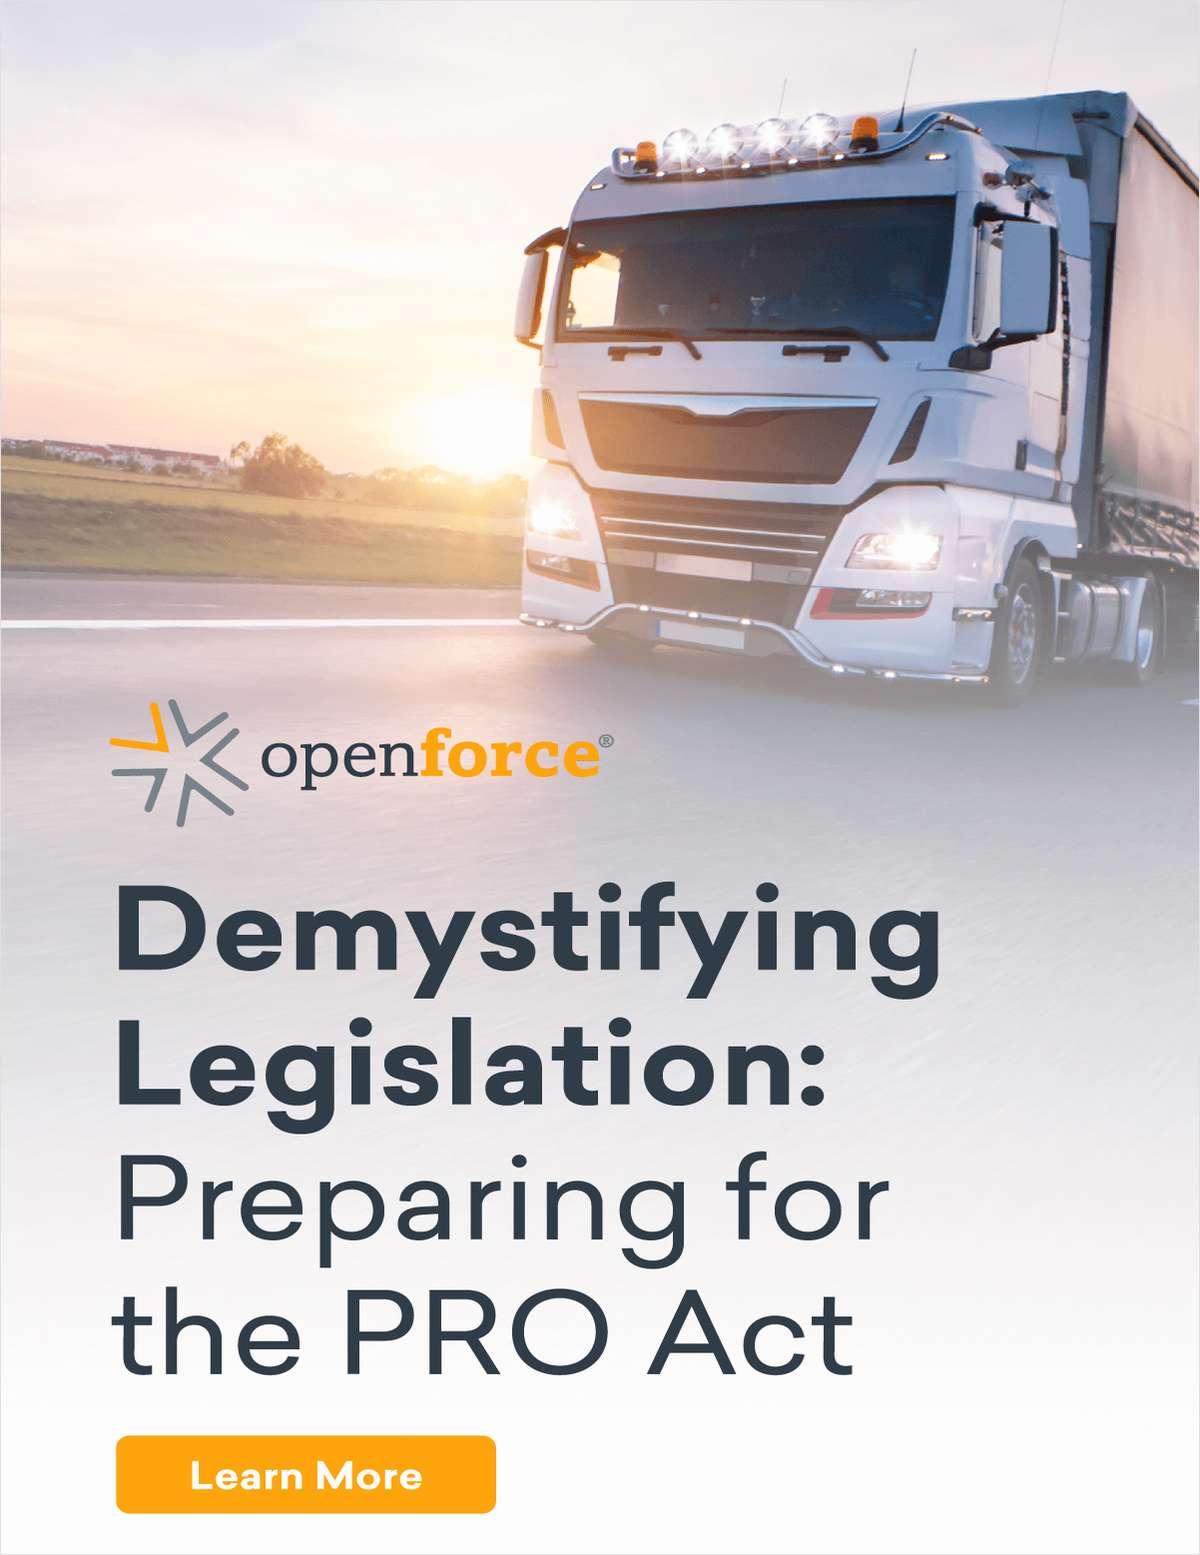 Demystifying Legislation: Preparing for the PRO Act